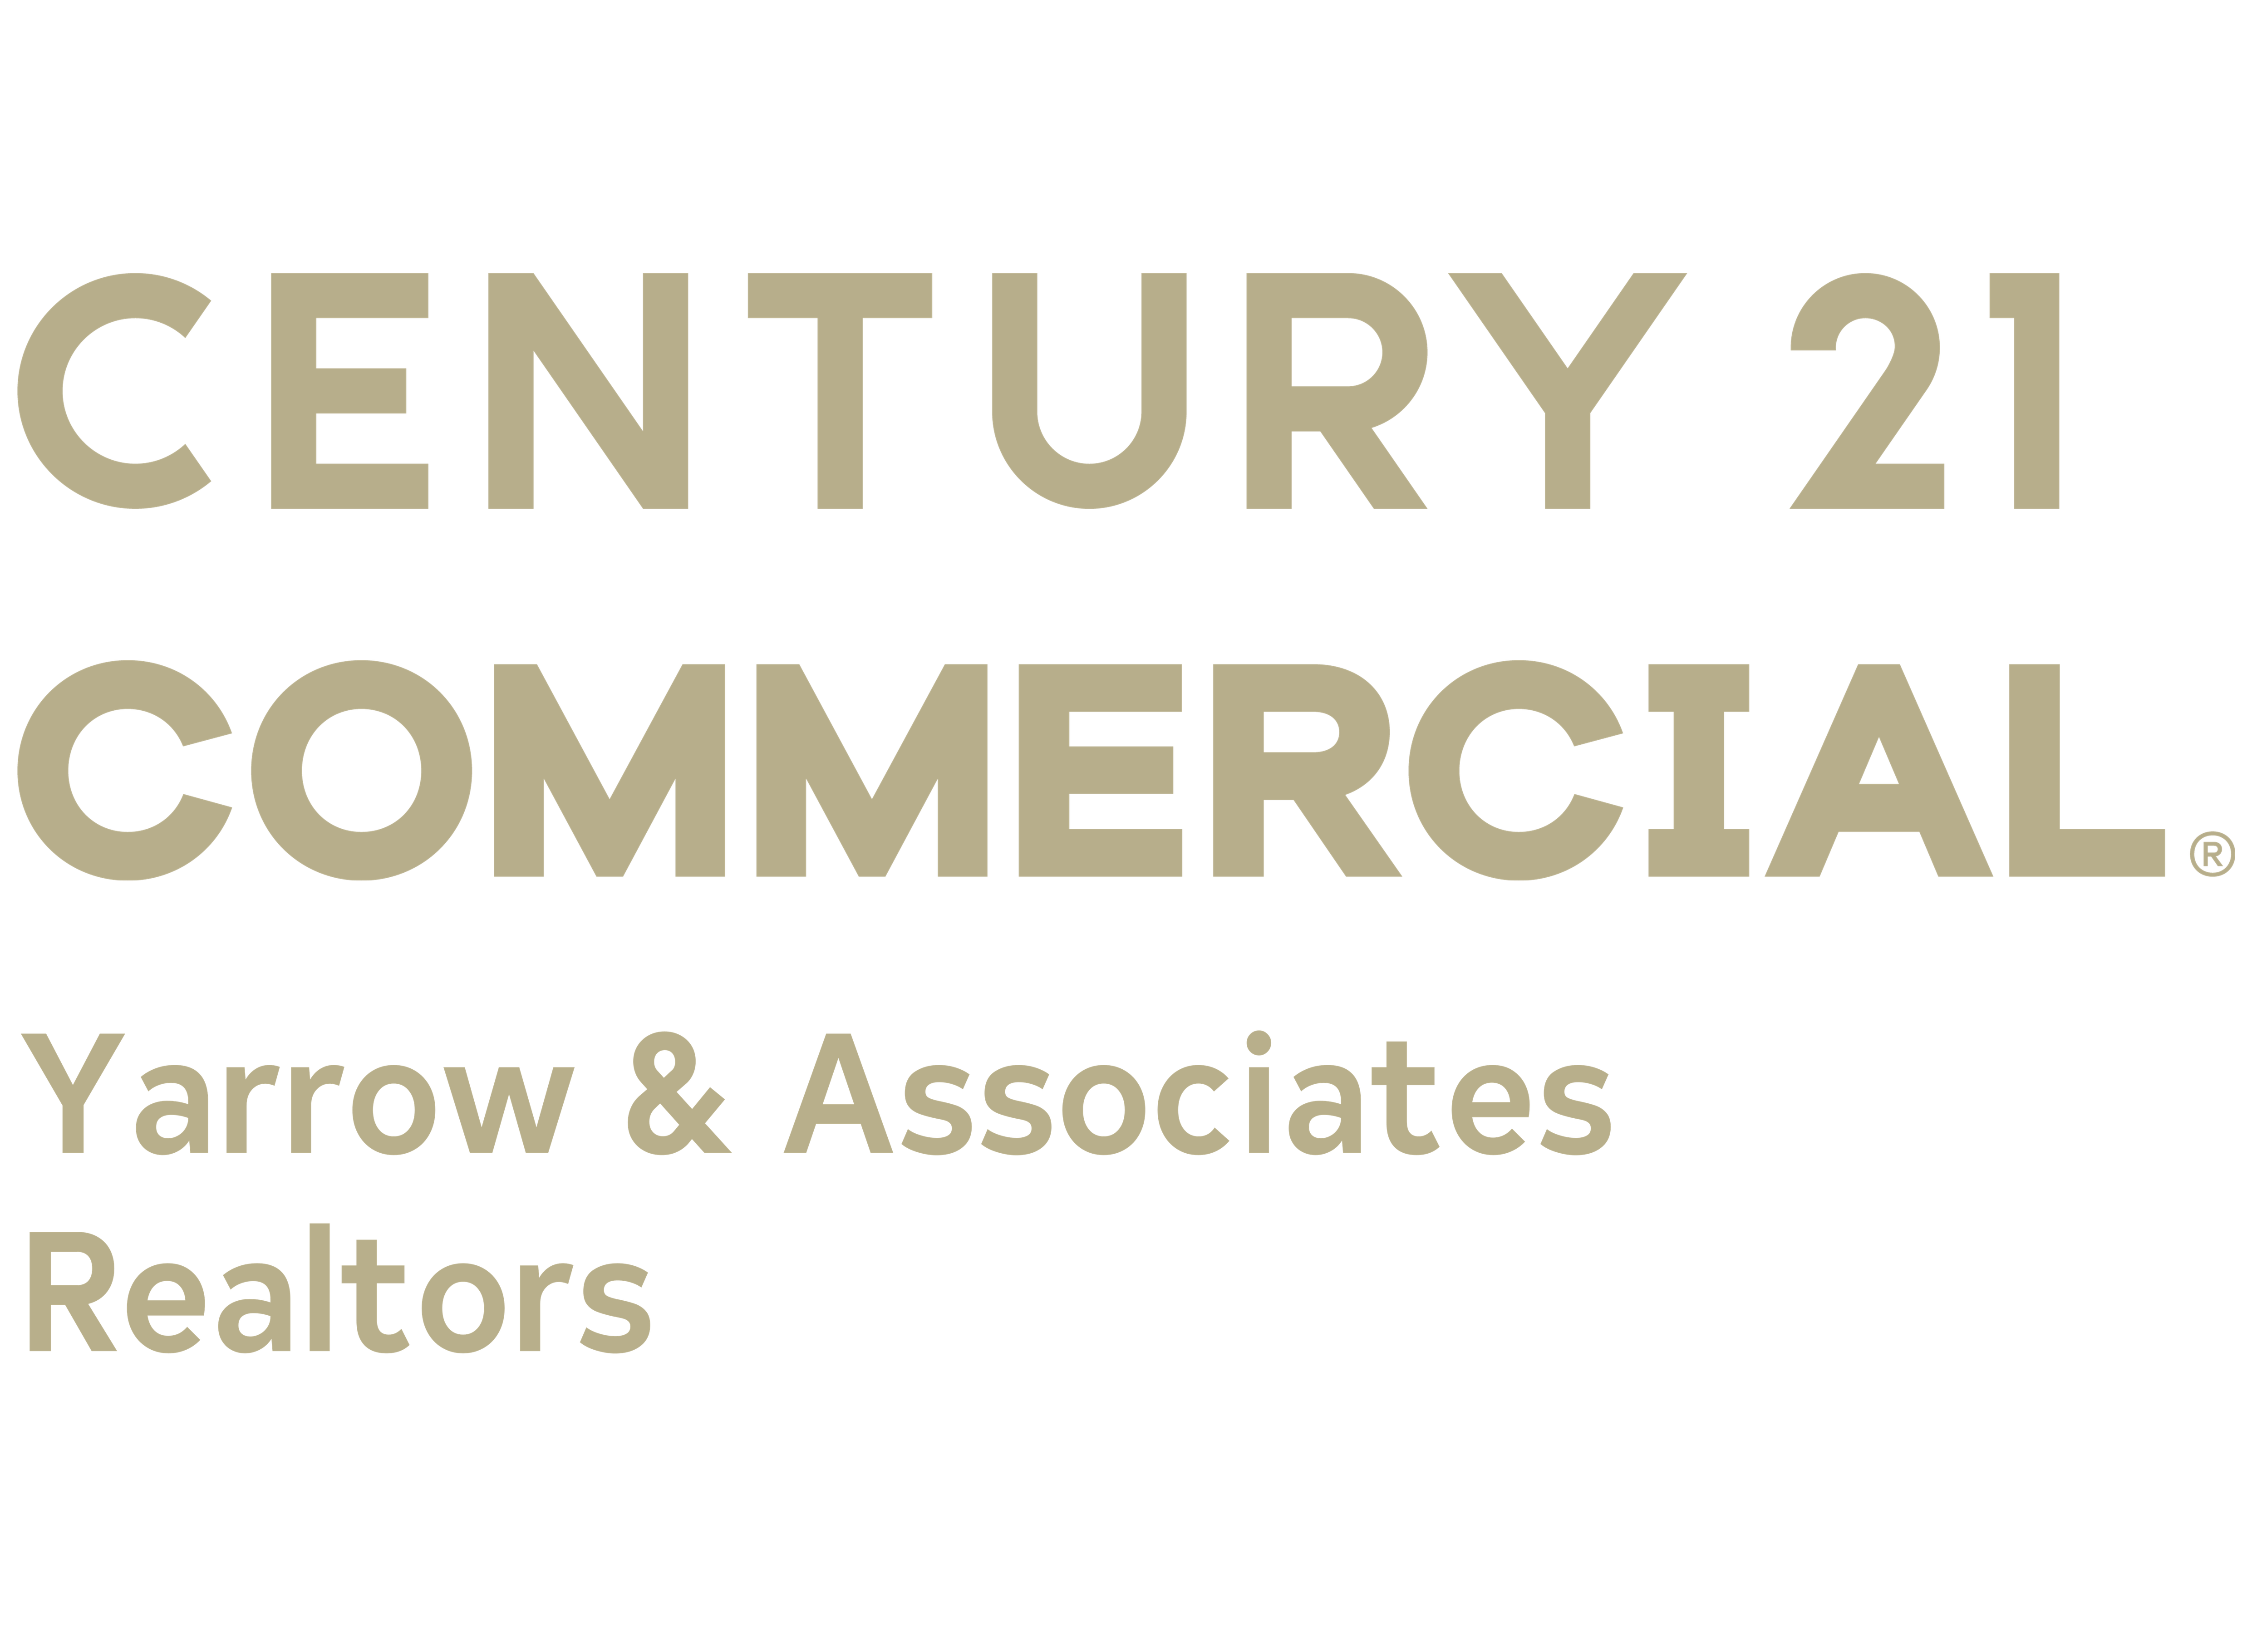 CENTURY 21 Yarrow & Associates Realtors